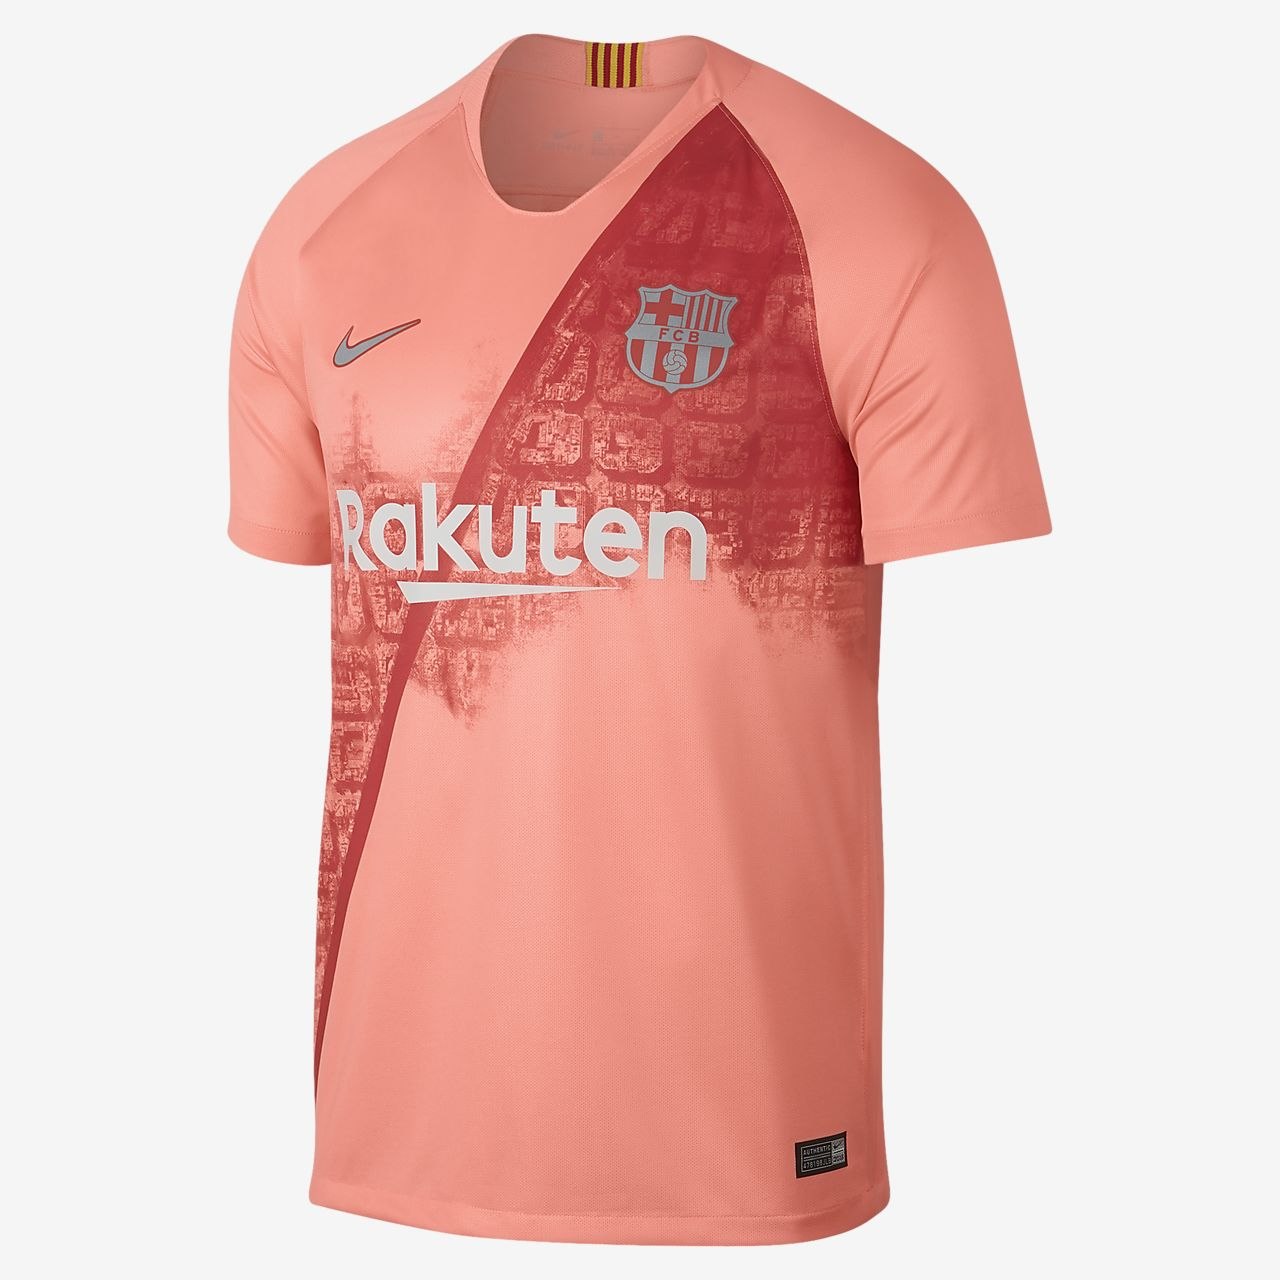 ... Camiseta de fútbol para hombre alternativa Stadium del FC Barcelona  2018 19 5e8ec7a00a8